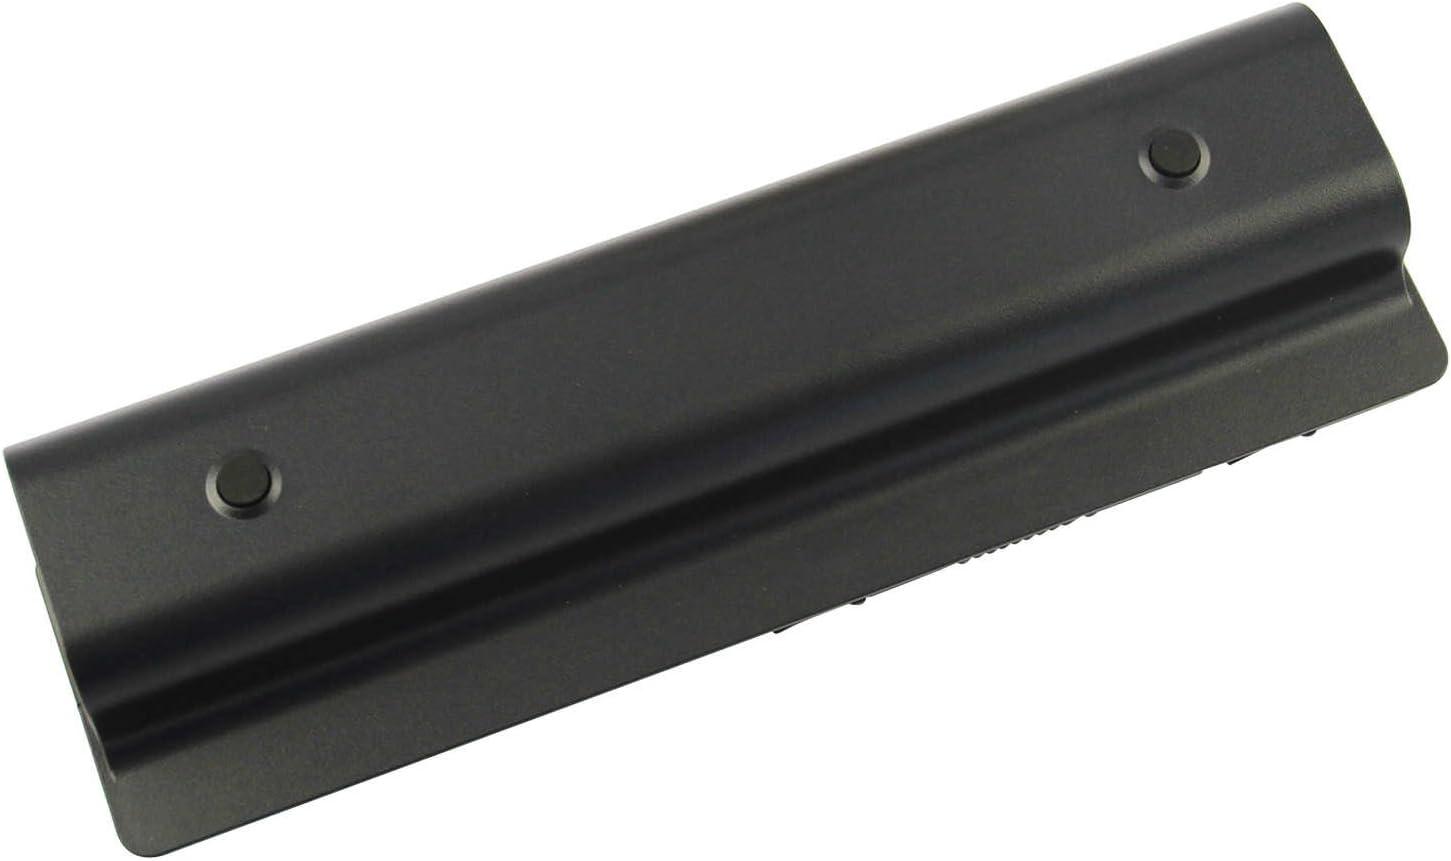 fits HP Pavilion DV4-1000 DV6-2150US DV4-1225DX G50 G60 G61 G70 G71 9 Cells 484171-001 484172-001 536436-001 HSTNN-CB72 HSTNN-UB72 Battery for Hp Spare Replace Battery DV5-1002TX